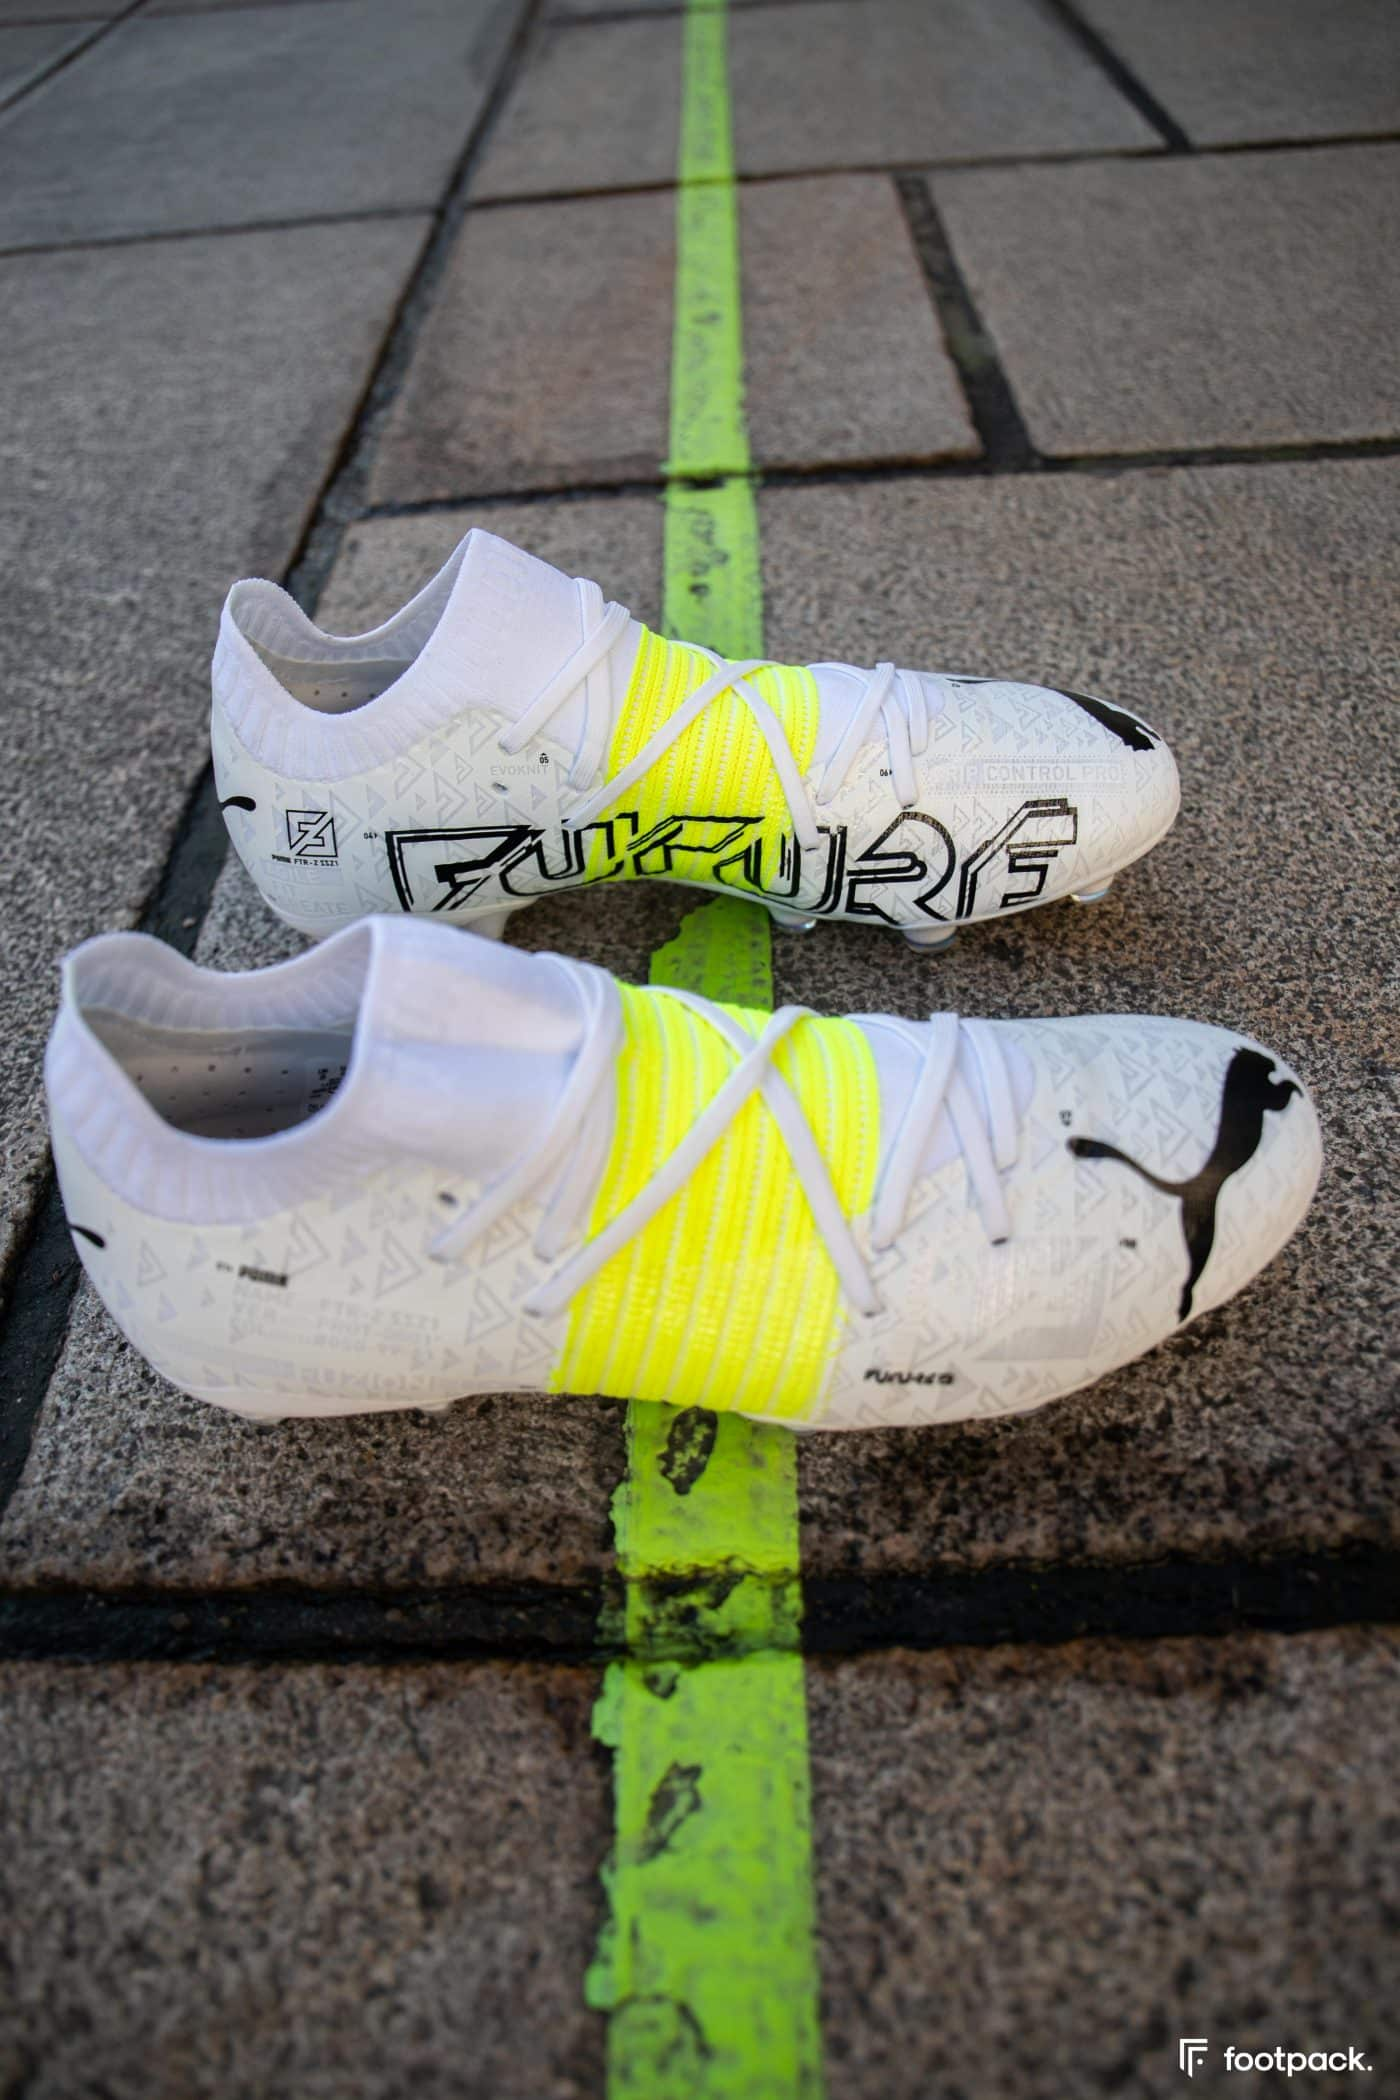 puma-future-z-teaser-edition-shooting-footpack-8